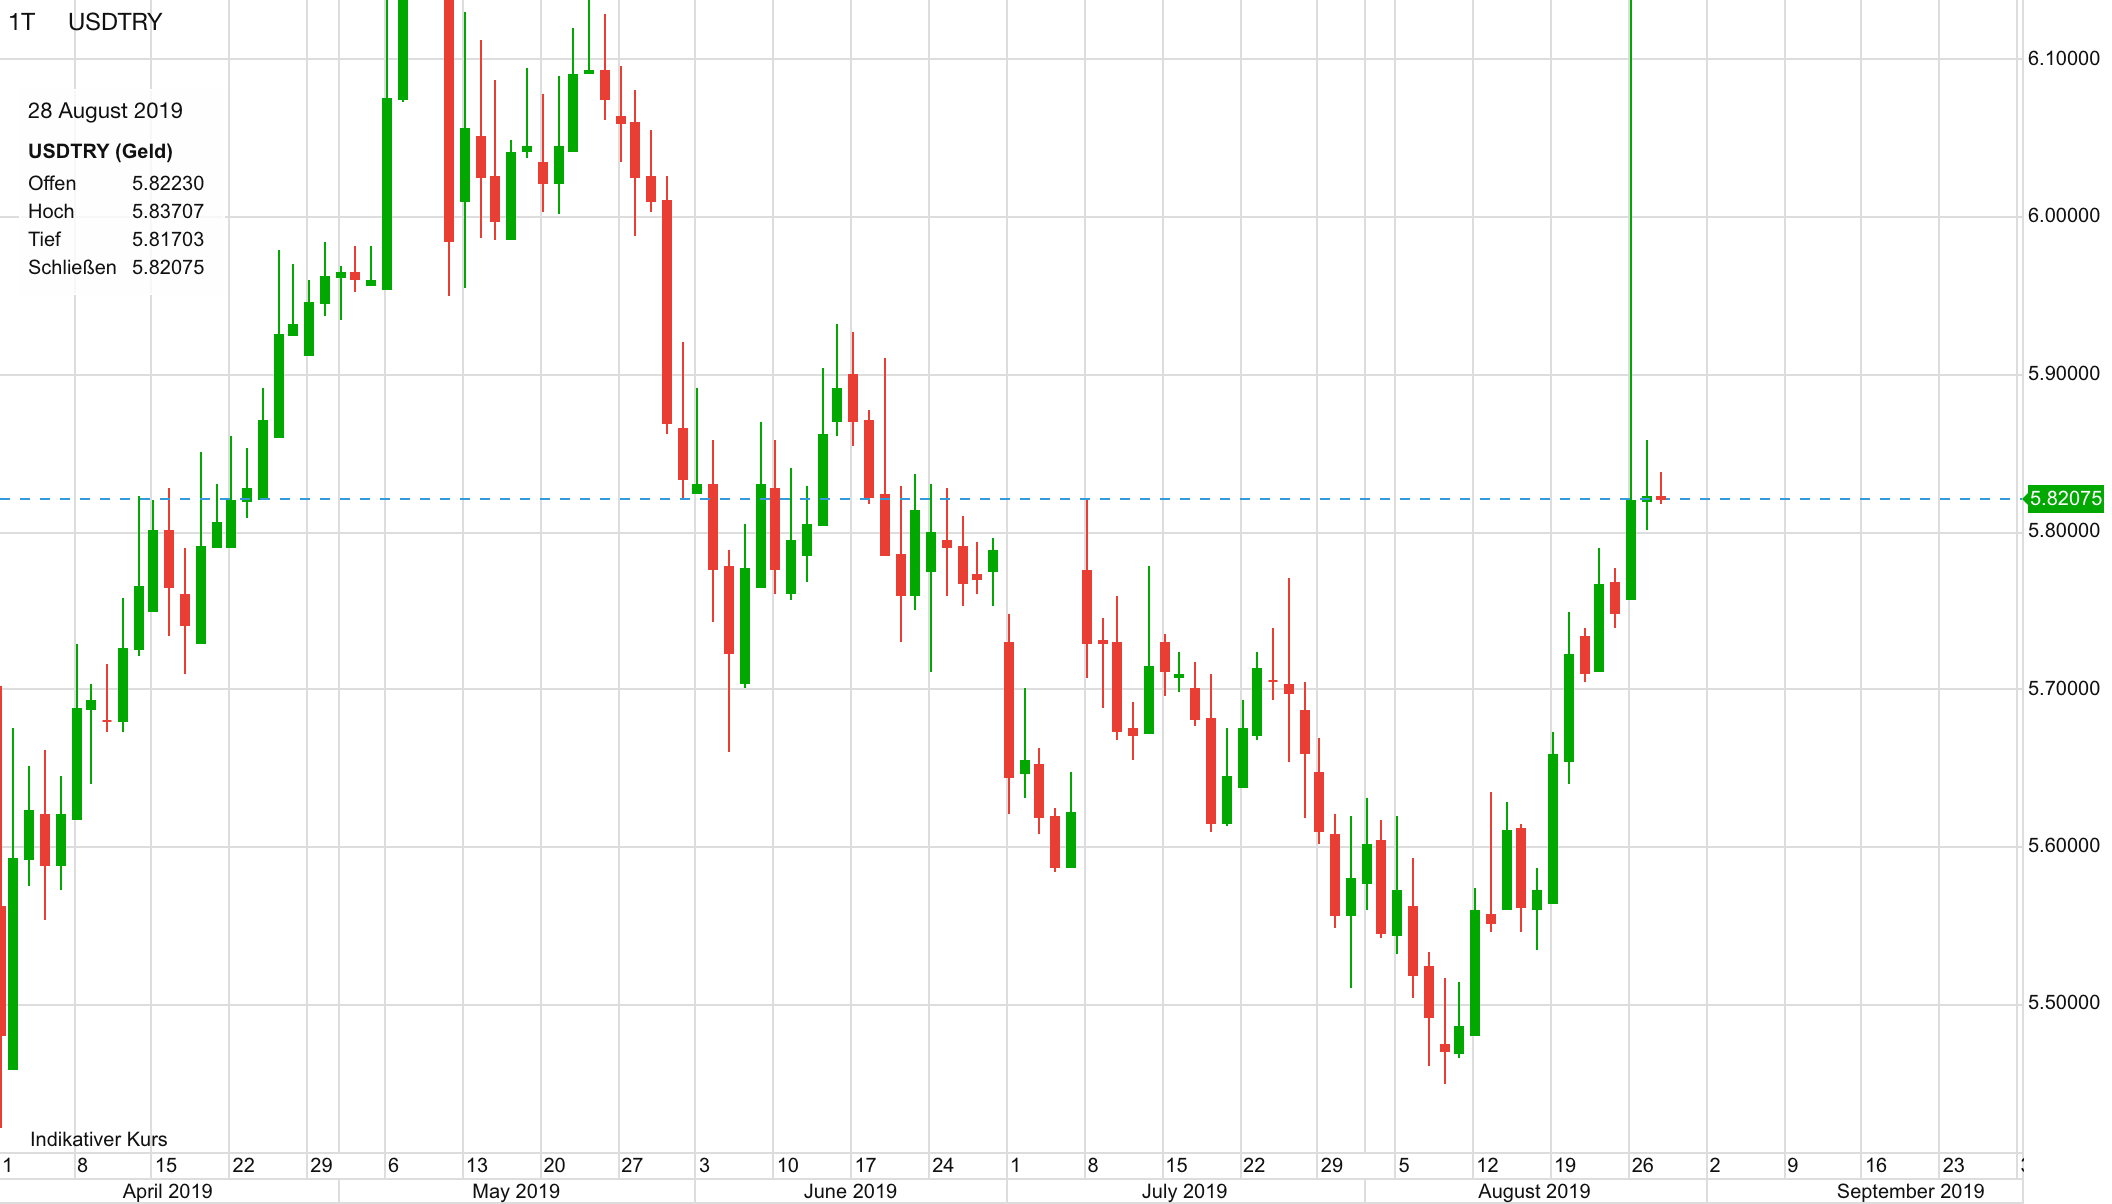 USD vs Türkische Lira seit April